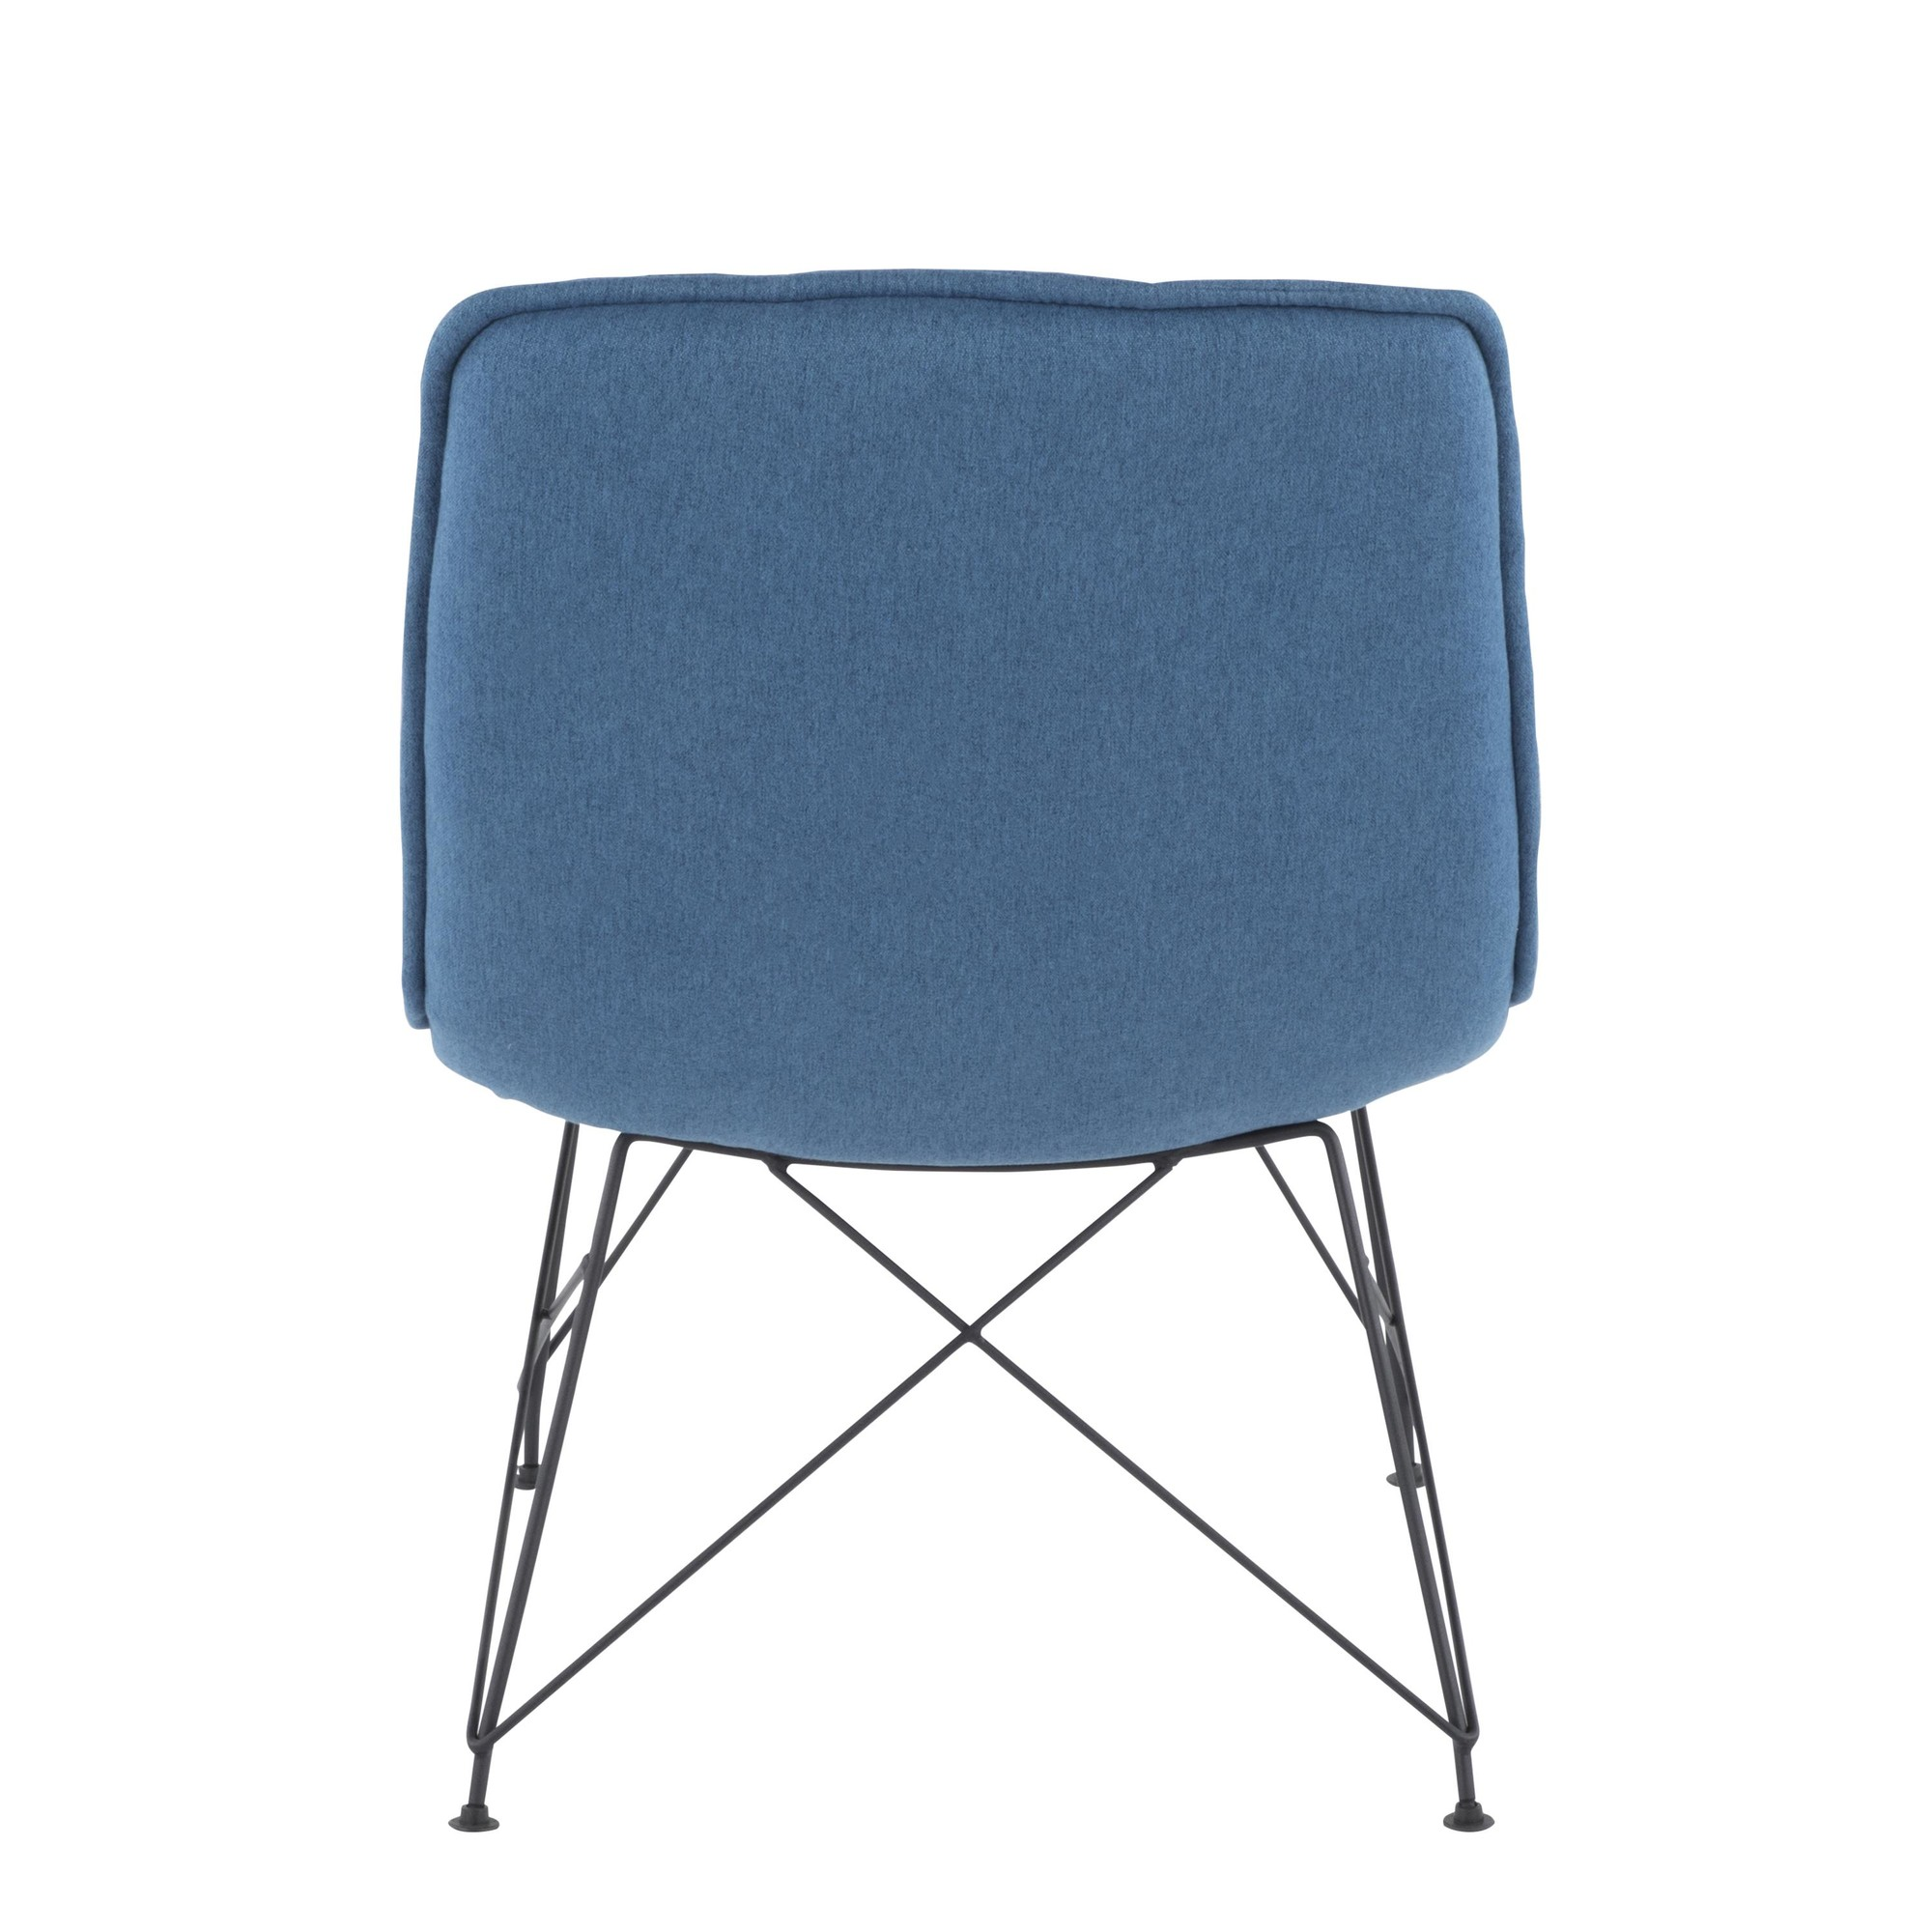 Wondrous Quad Accent Chair Lumisource Stylish Decor At Affordable Evergreenethics Interior Chair Design Evergreenethicsorg